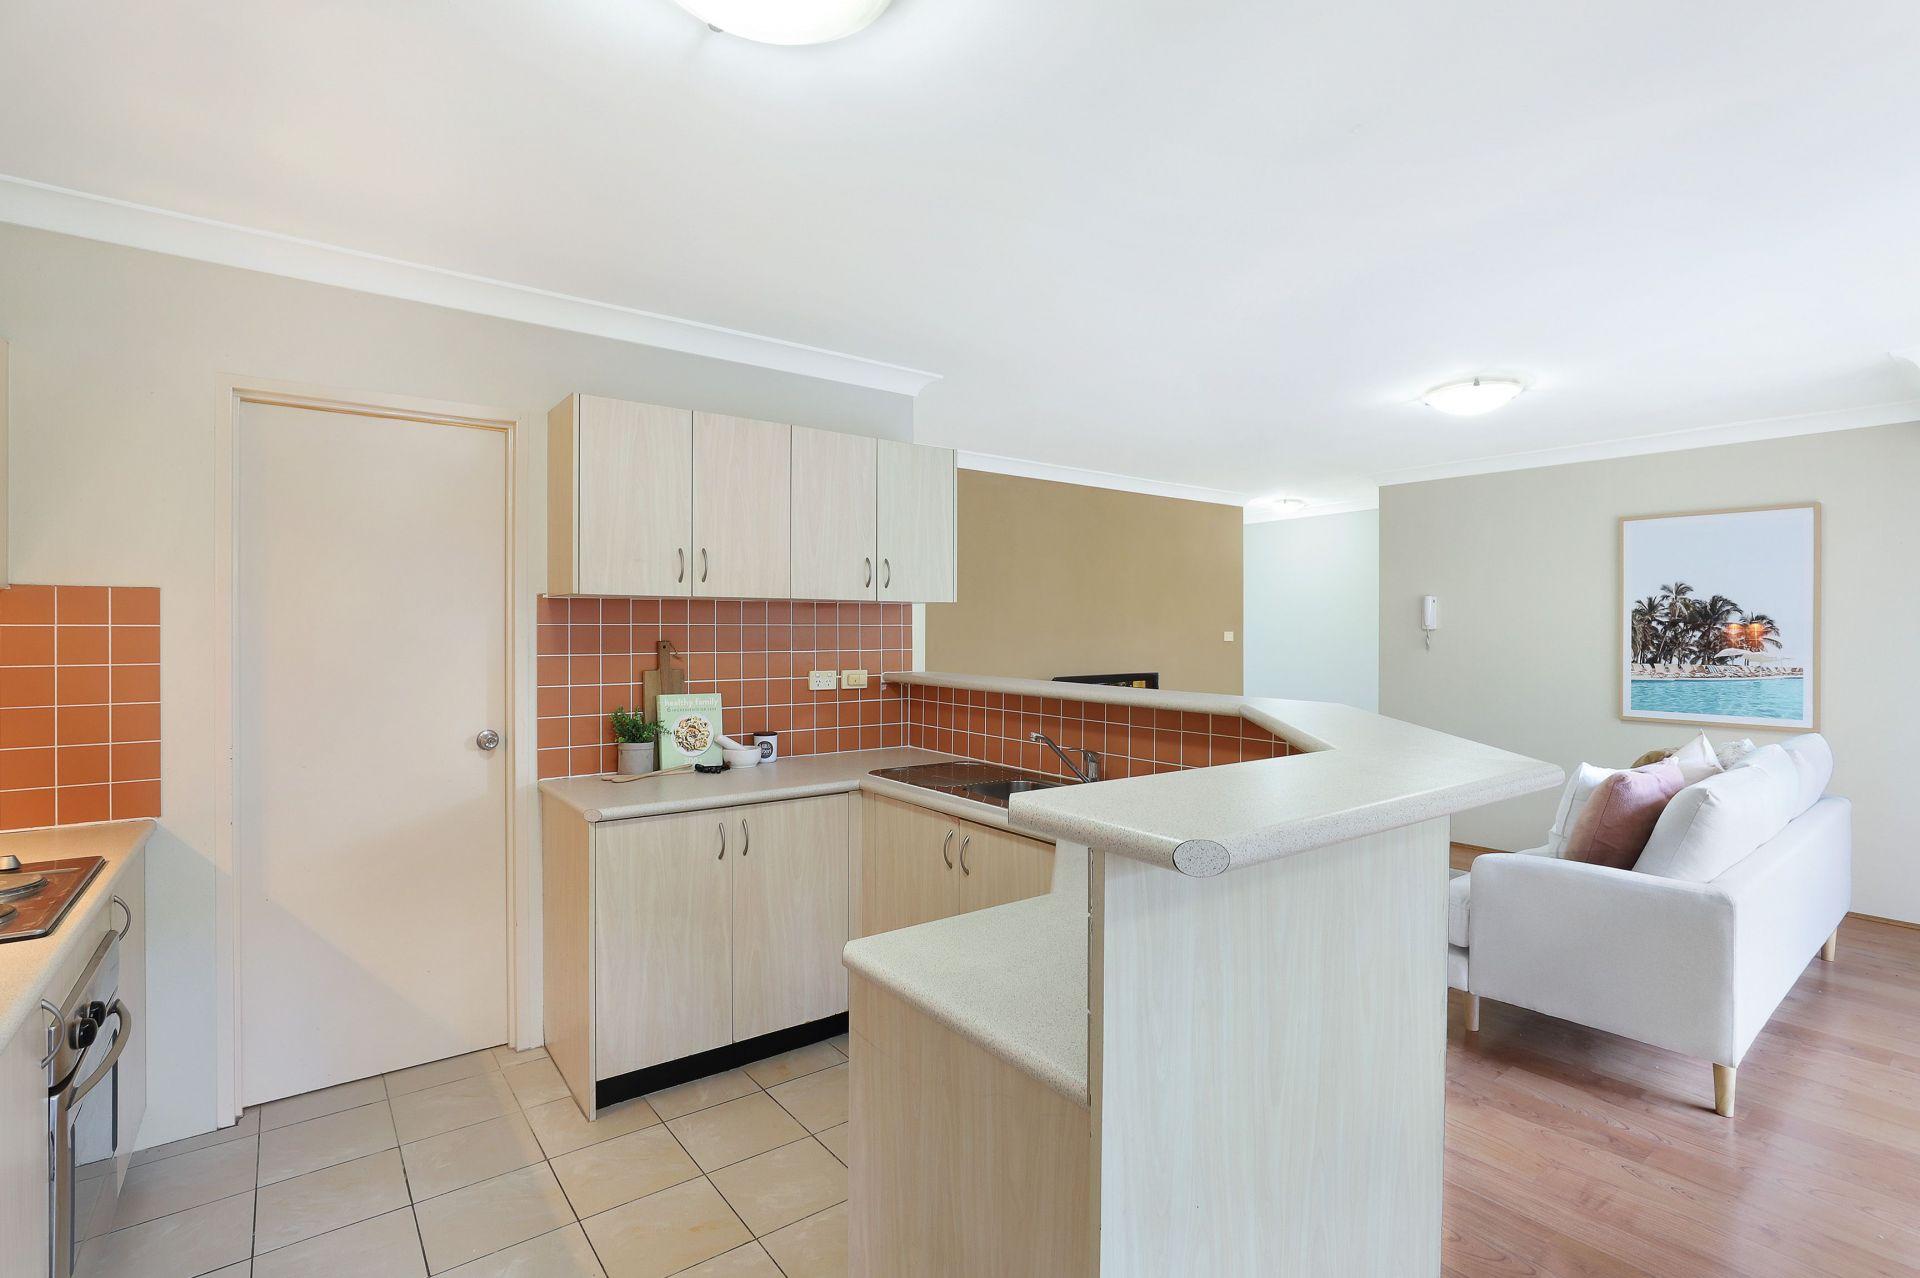 16/50-56 Merton Street, Sutherland NSW 2232